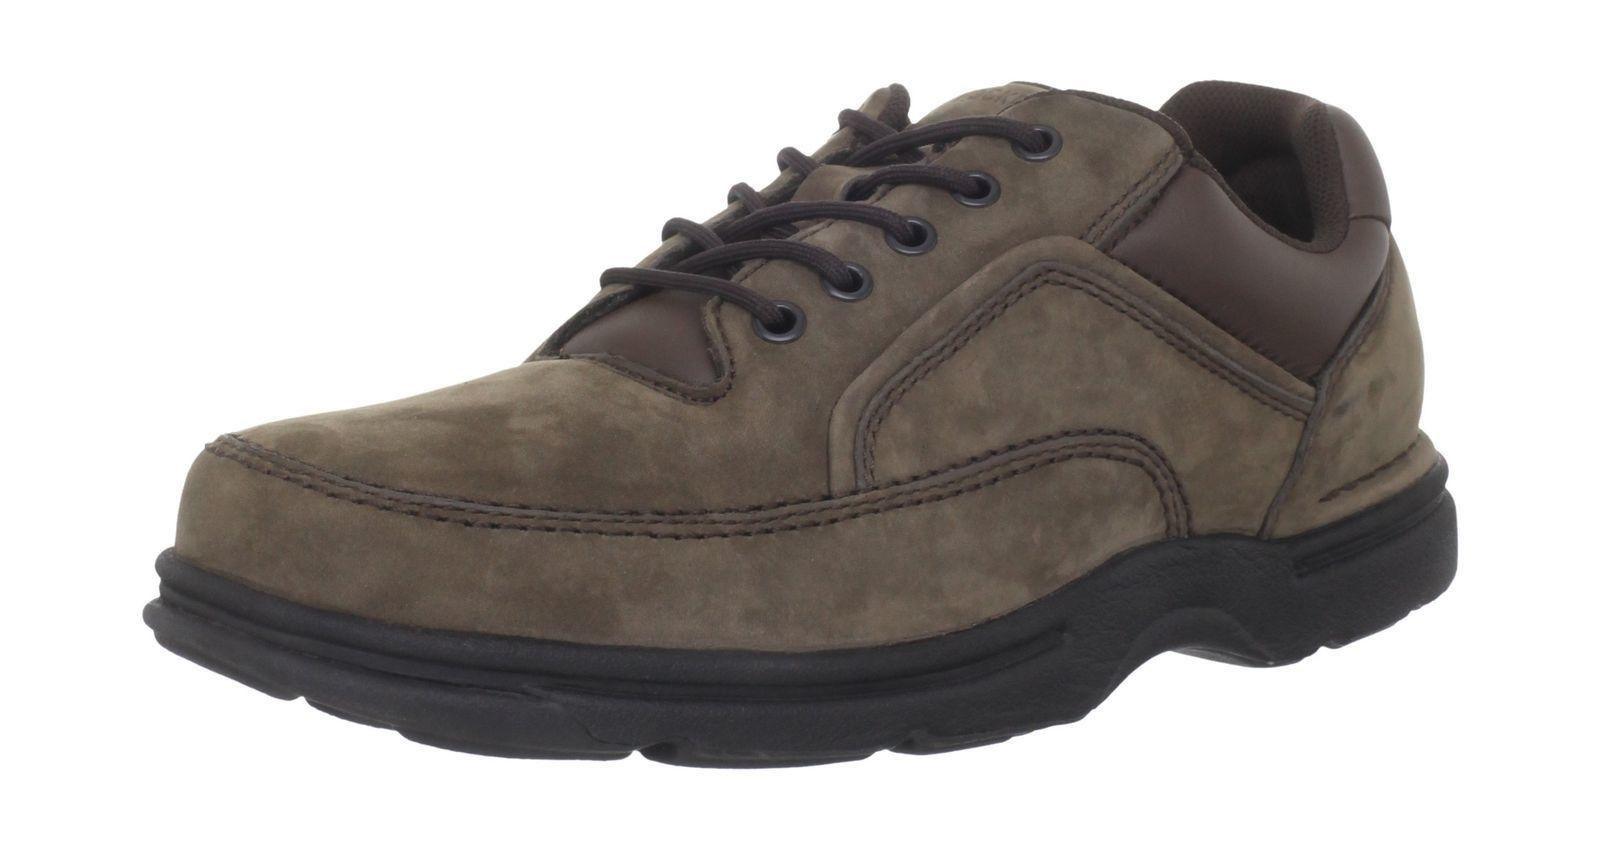 Mens Eureka Sneaker, Brown, 7 M US Rockport